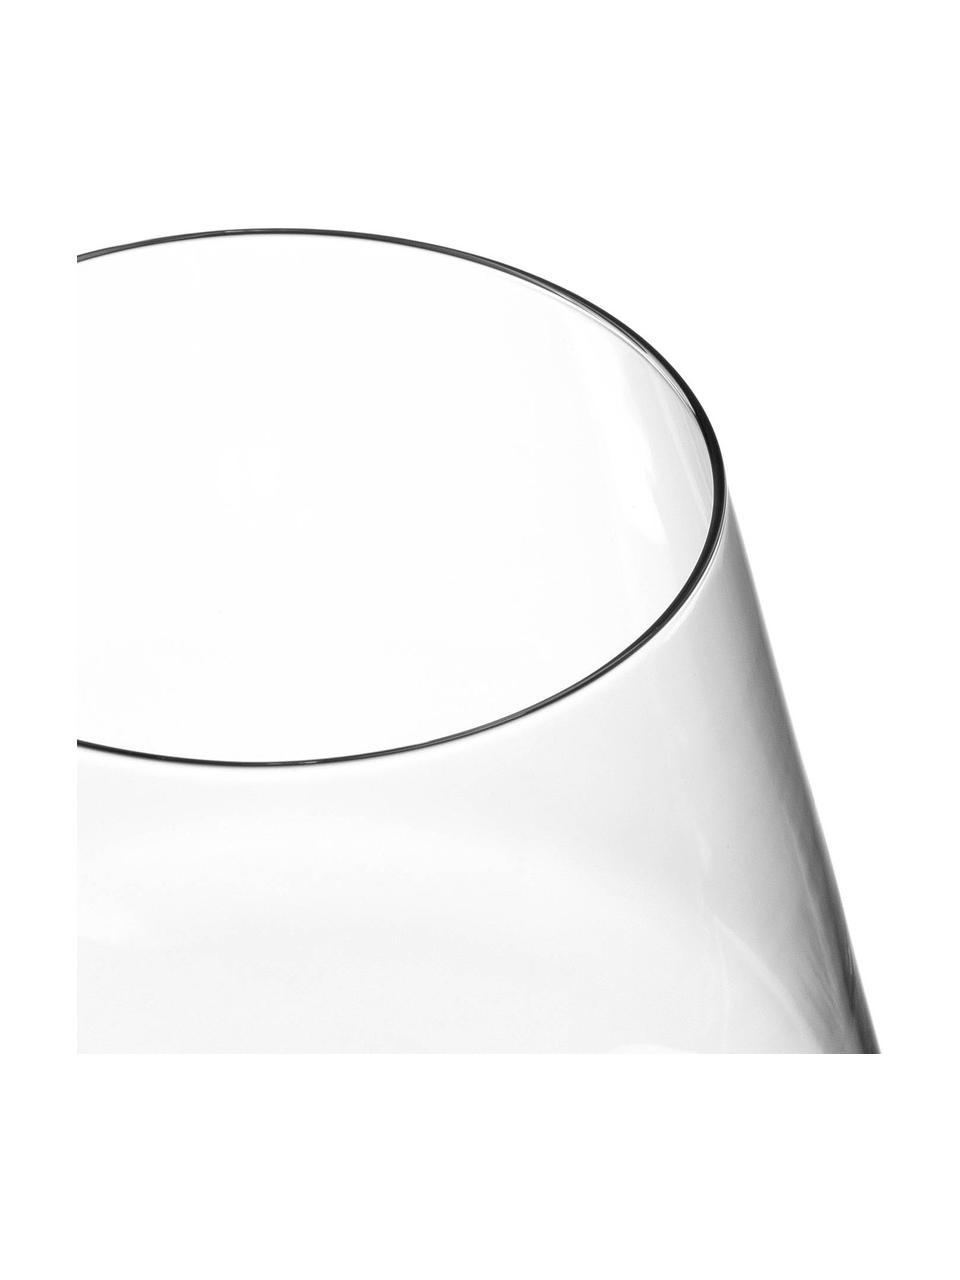 Rode wijnglazen Puccini, 6 stuks, Teqton®-glas, Transparant, Ø 11 x H 23 cm